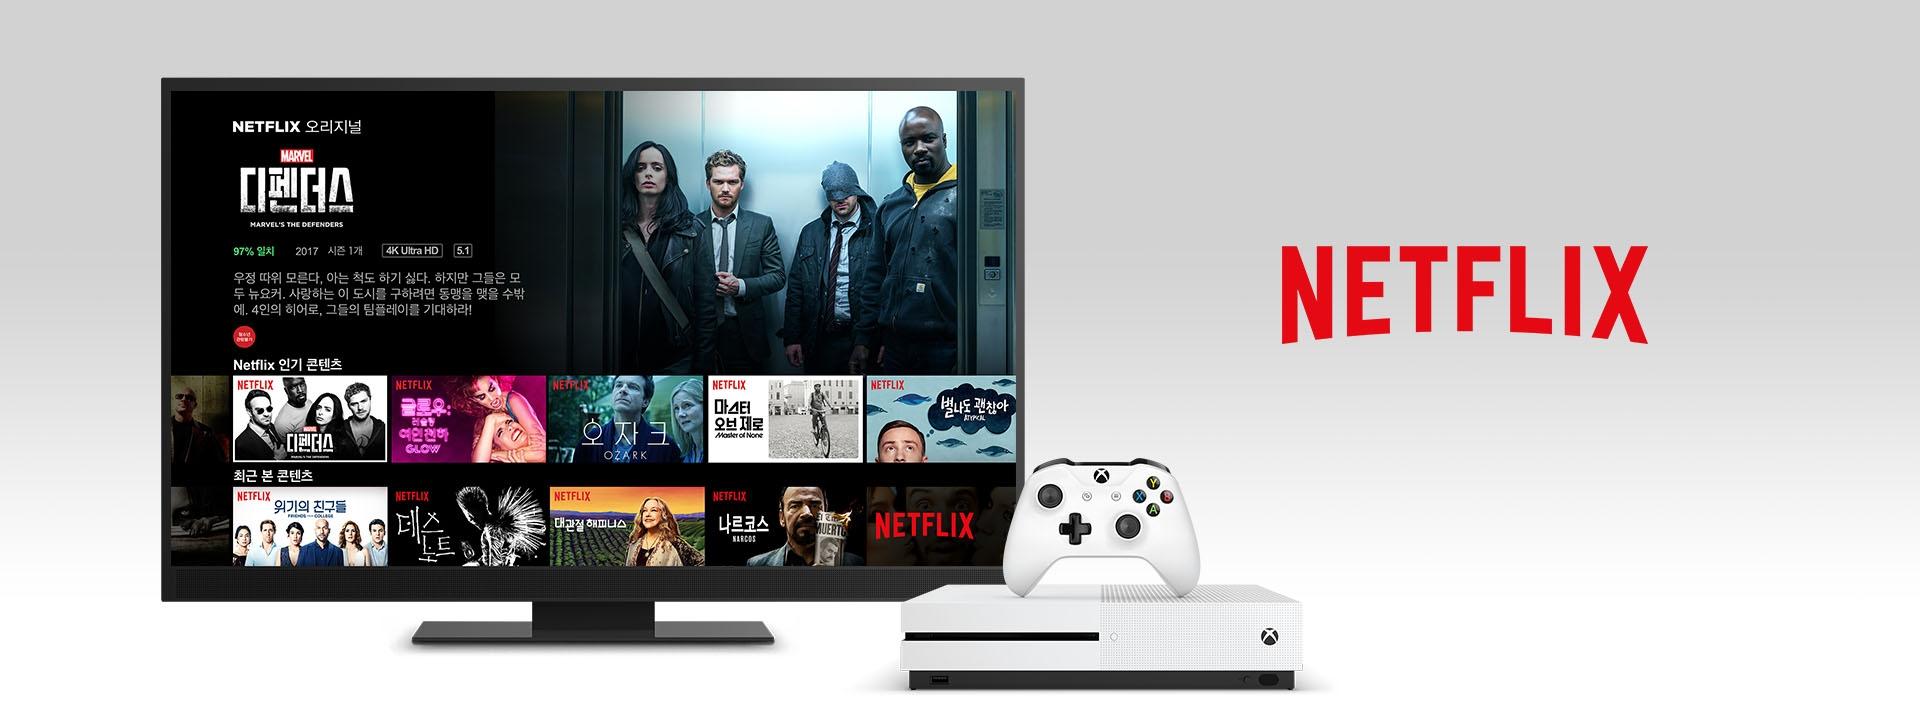 Xbox One으로 즐기는 넷플릭스